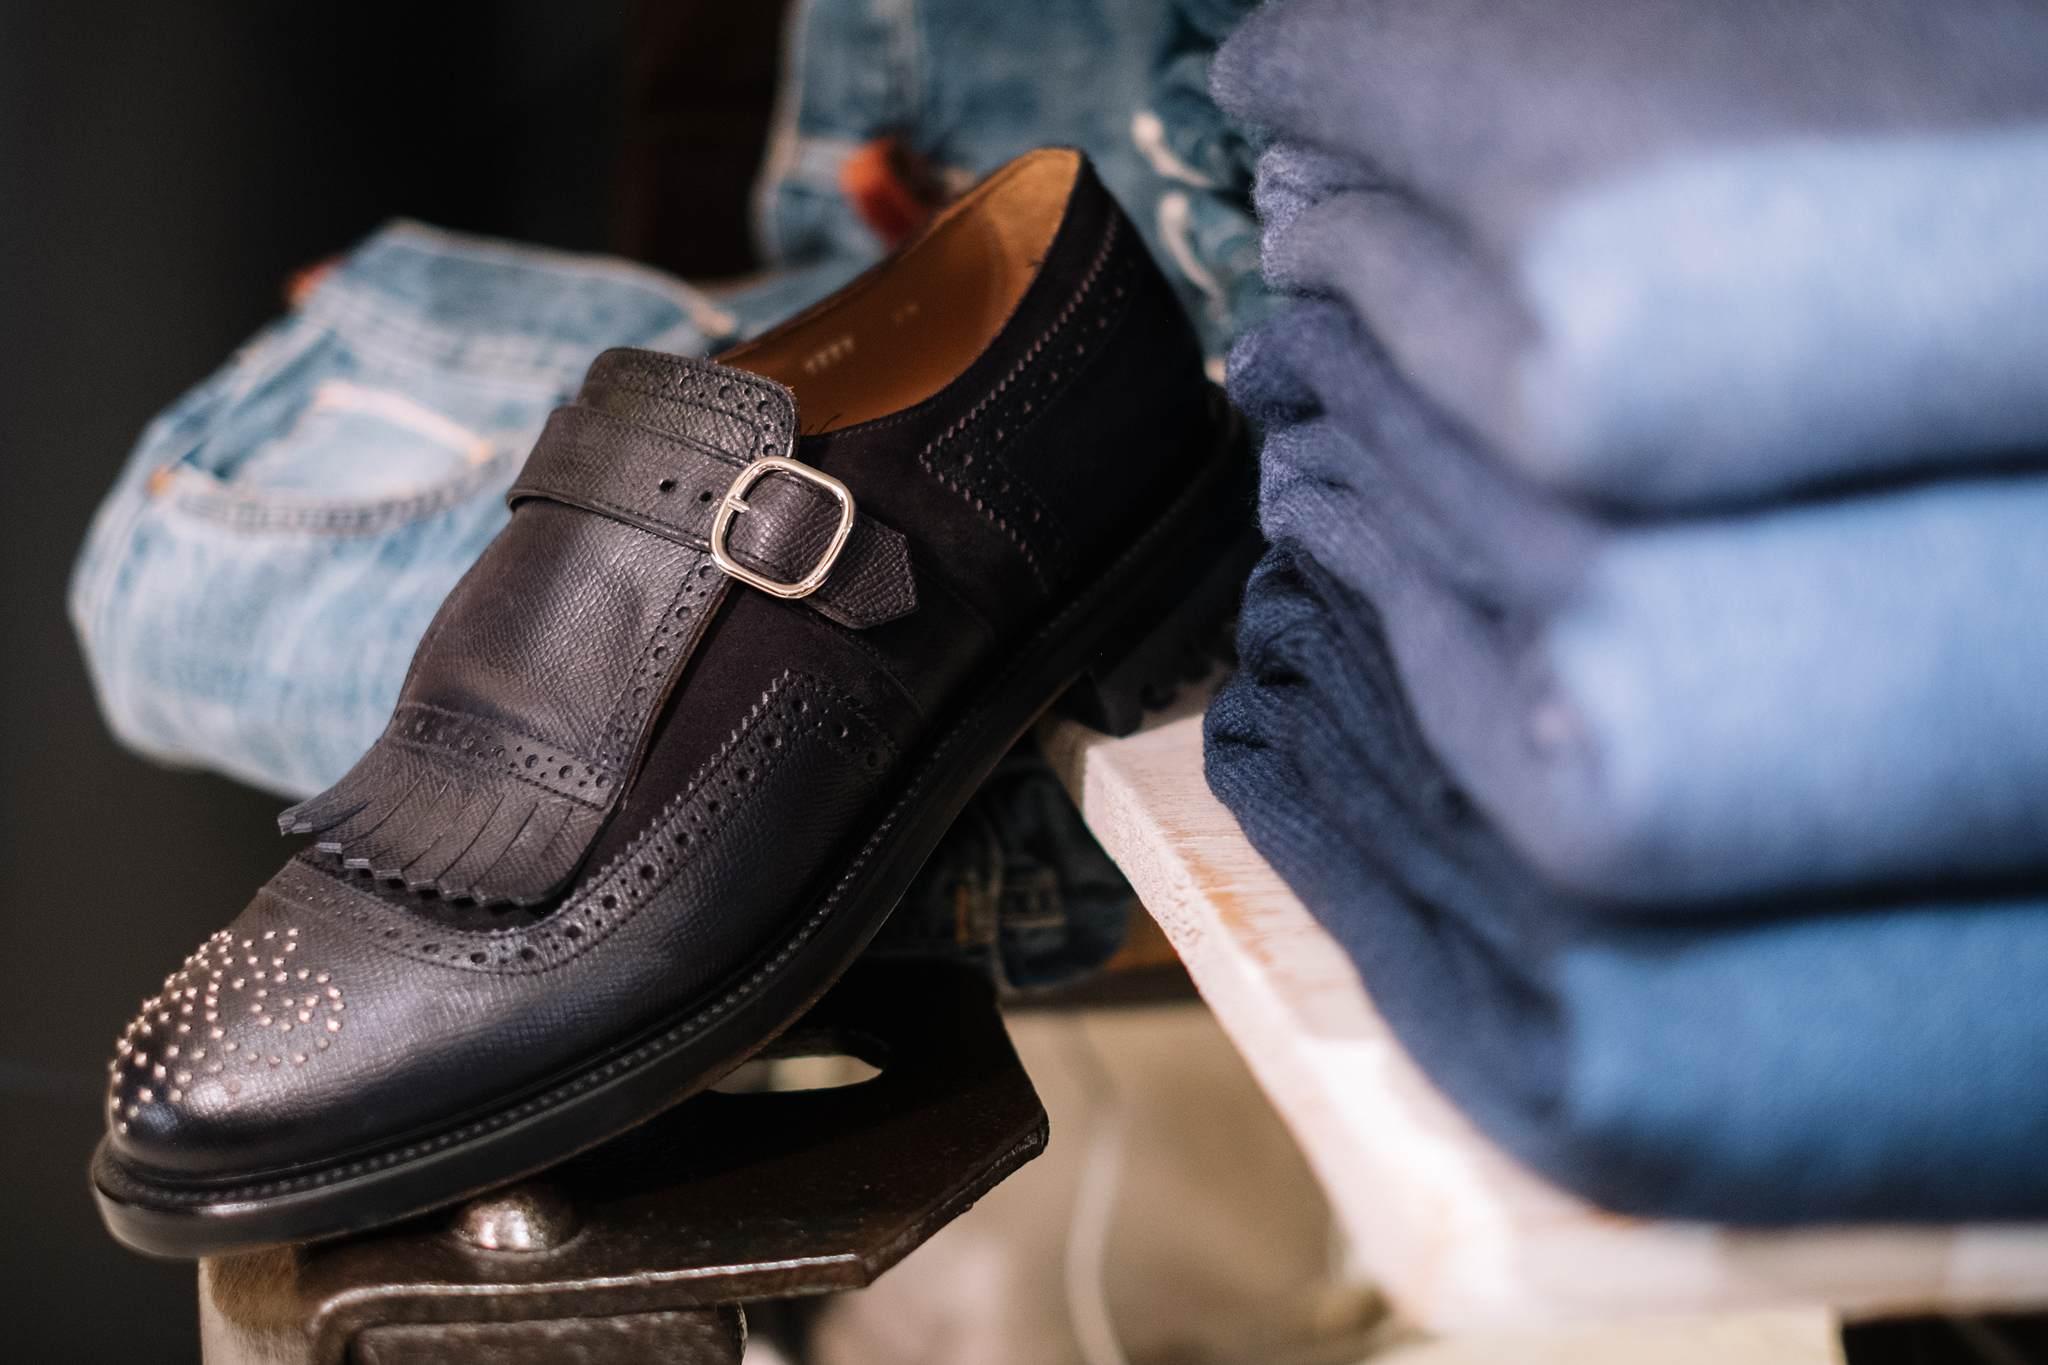 abbigliamento uomo Venezia pot pourri boutique fashion for man